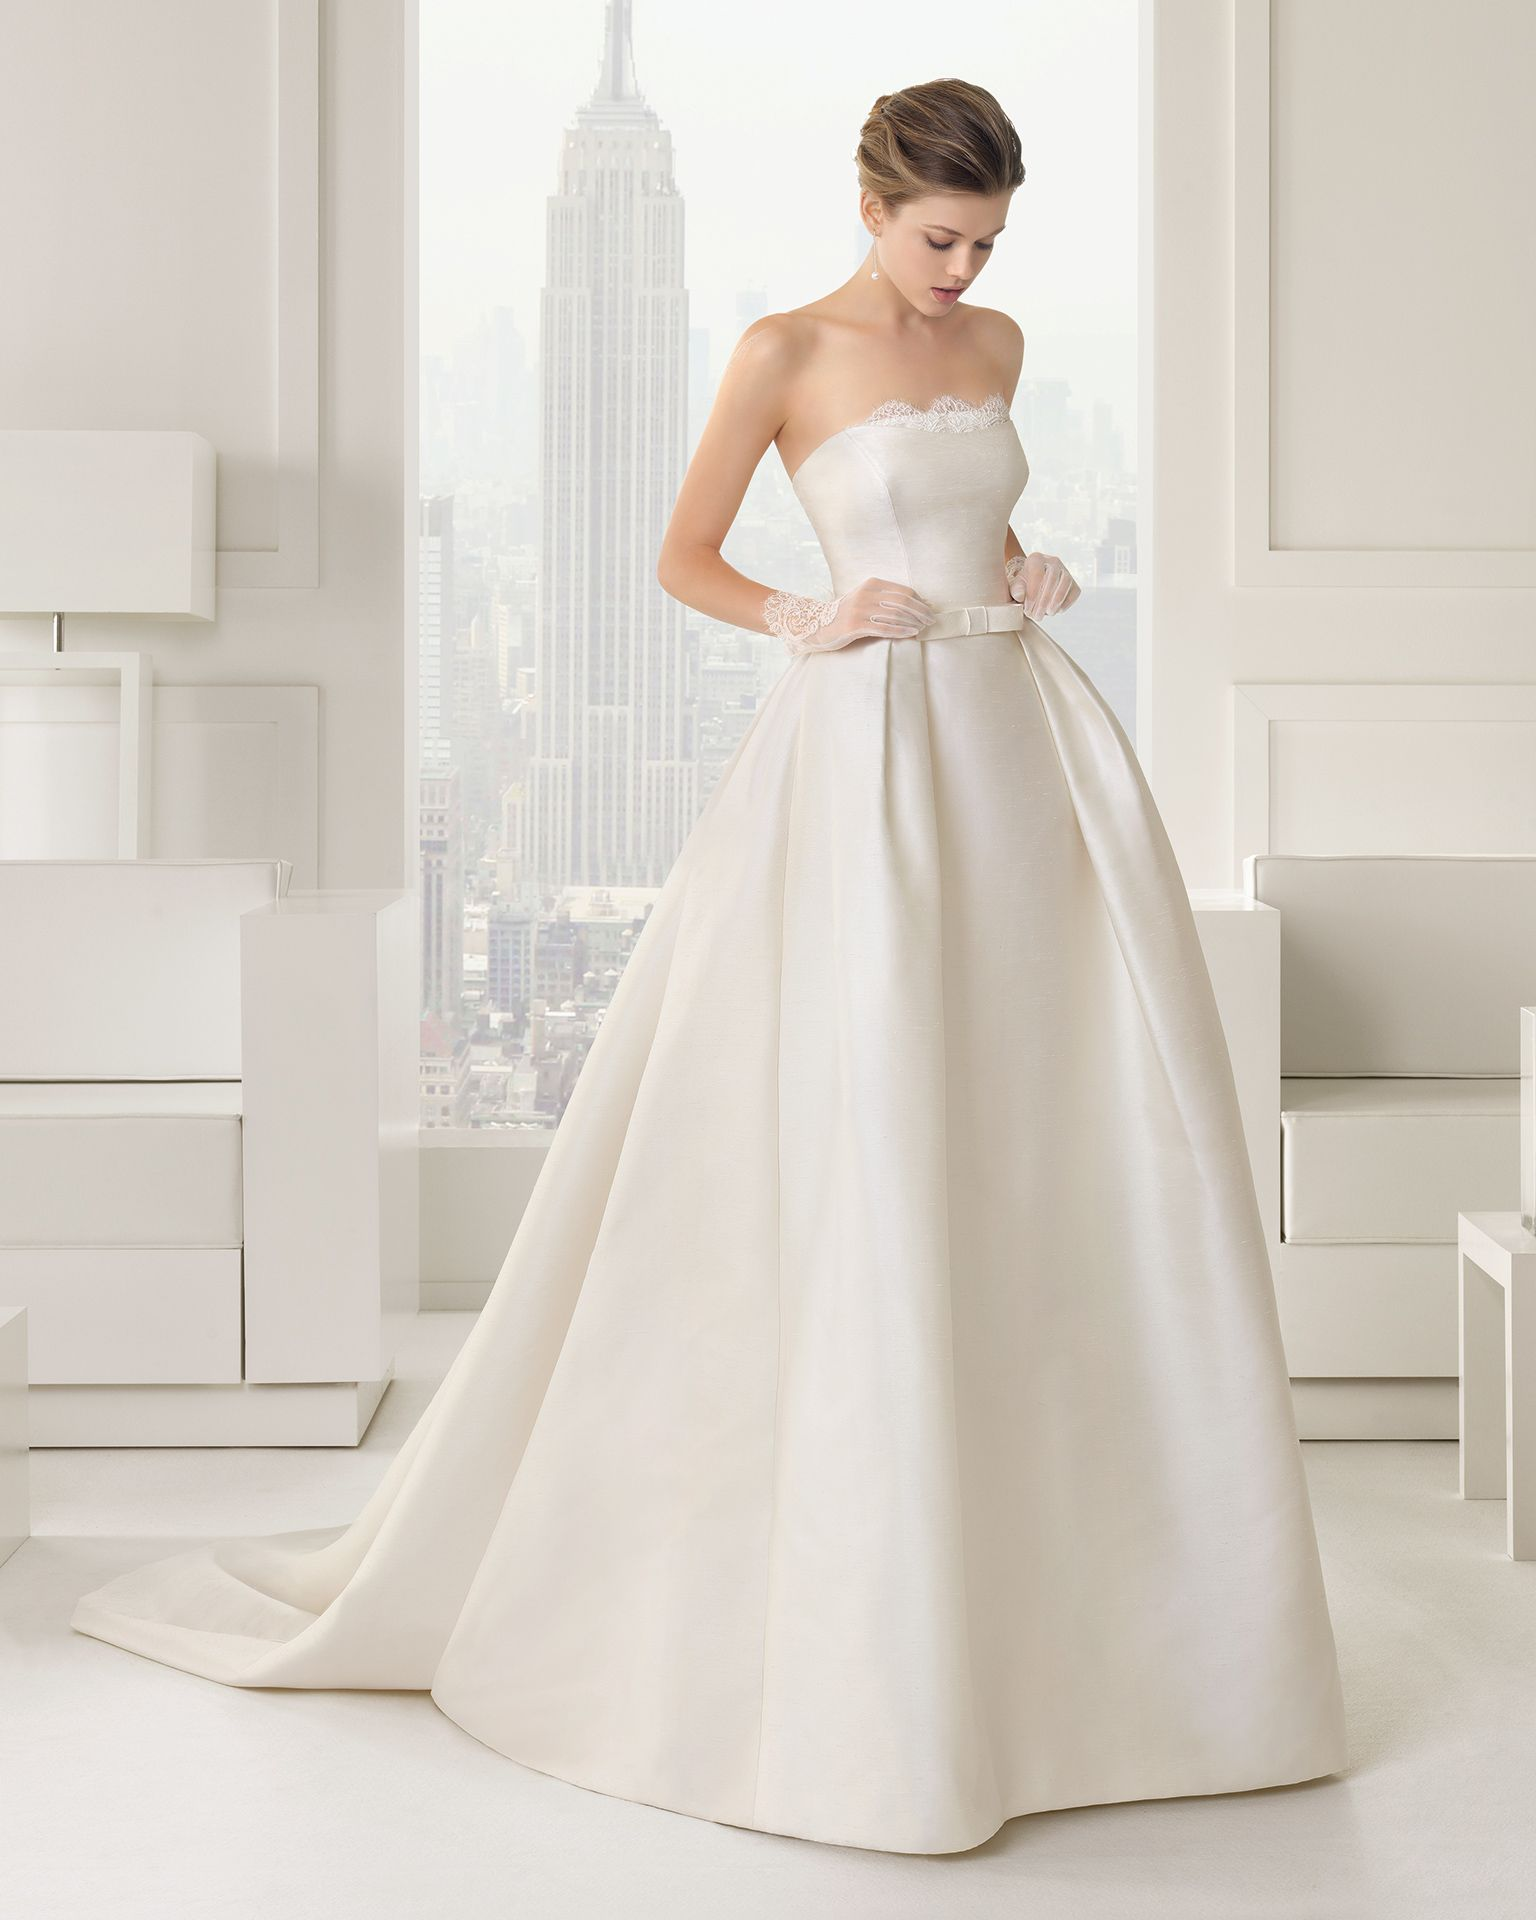 Simple Elegant 2015 Women Summer Wedding Dresses Flowing: Rosa Clara Wedding Dresses 2015